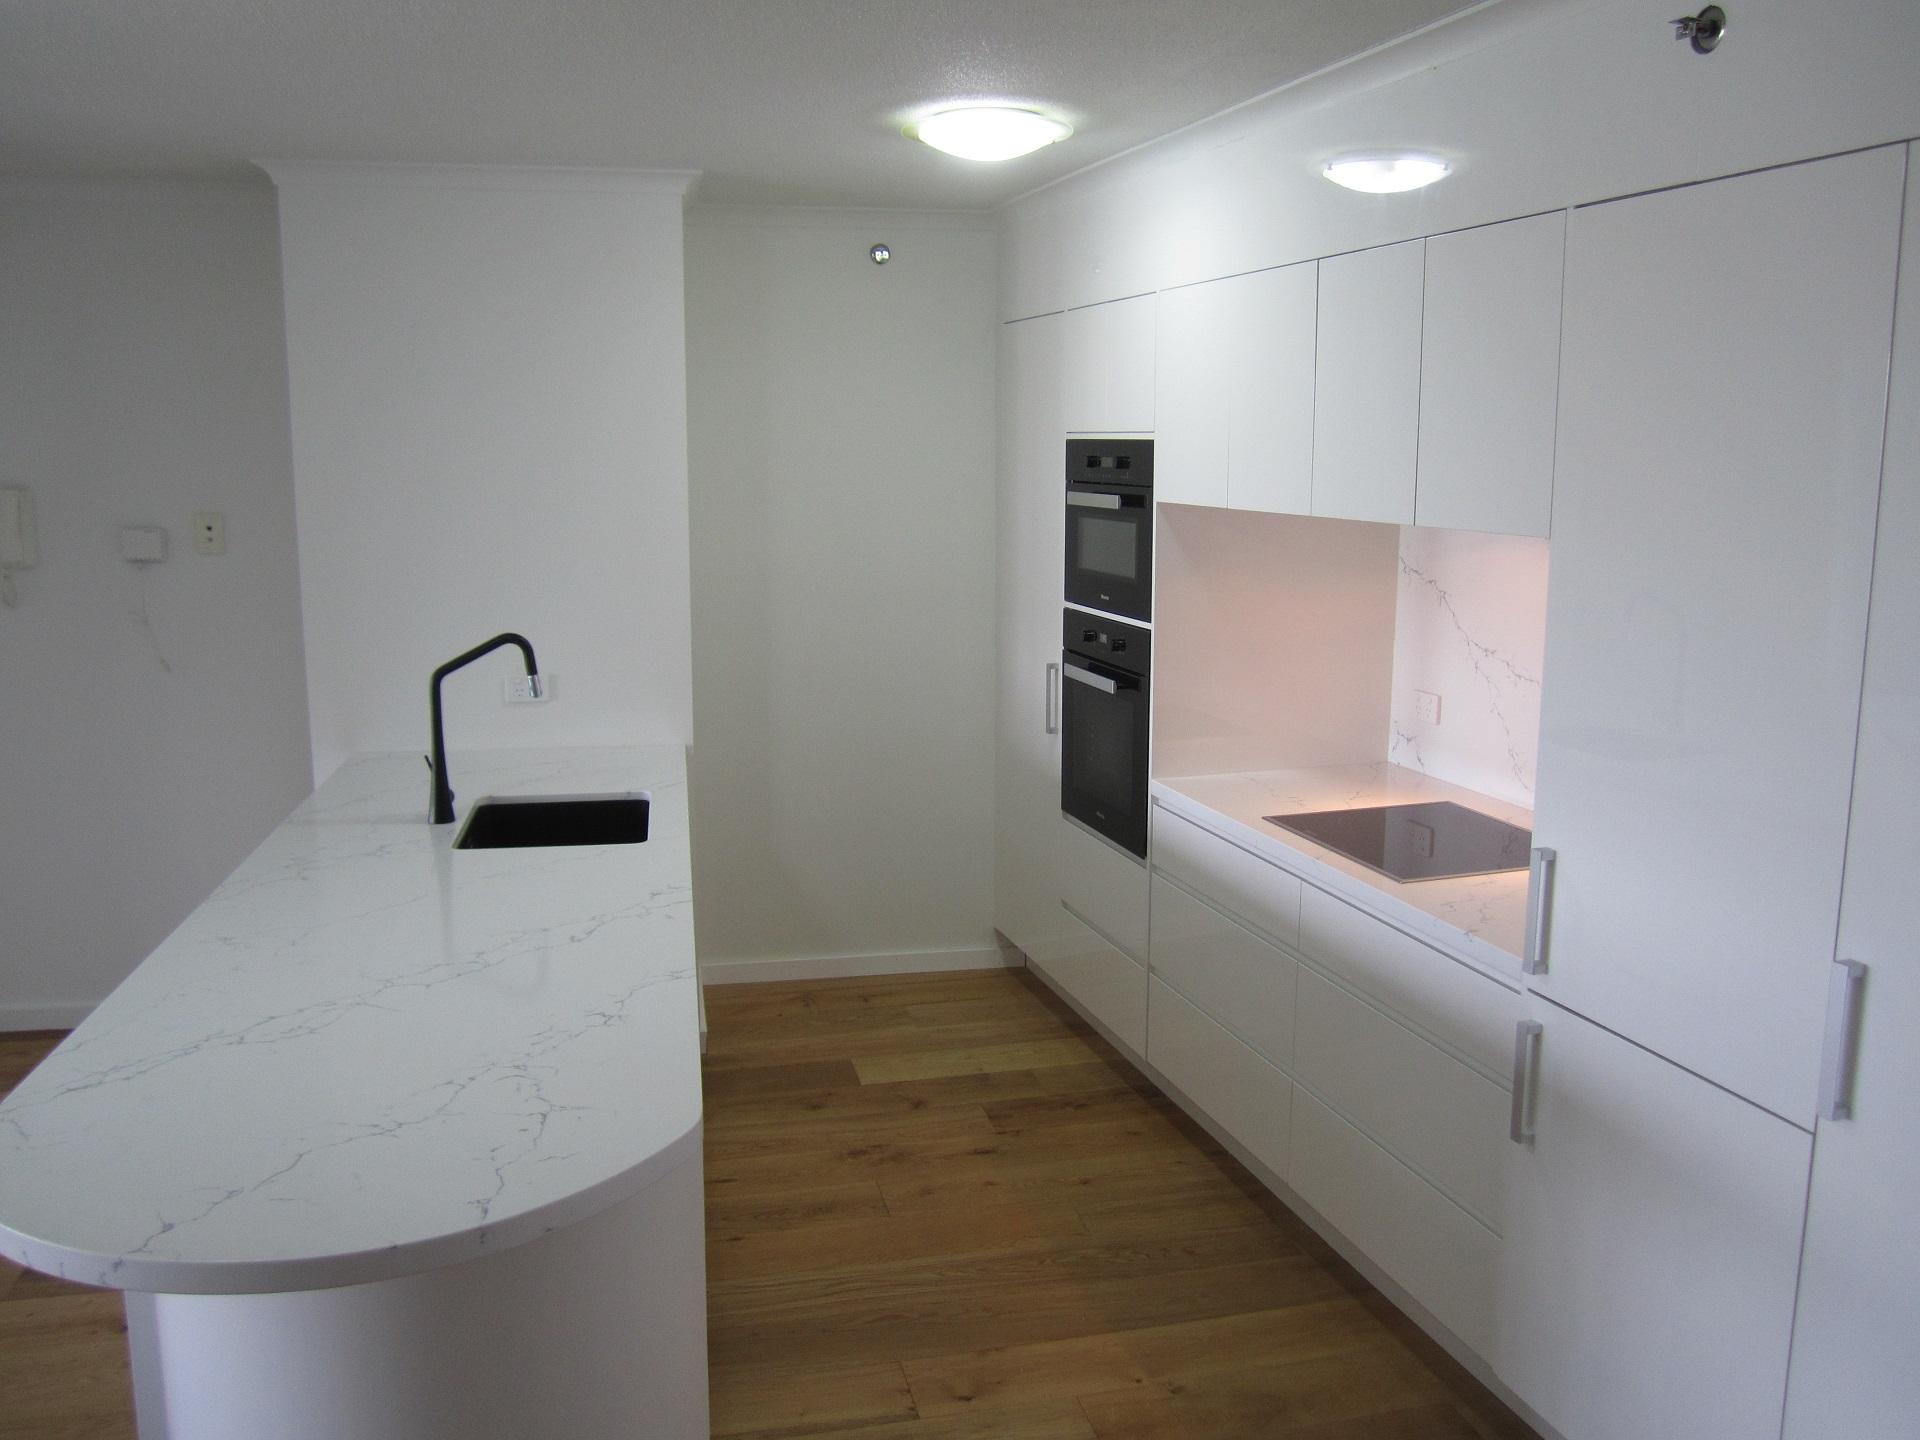 Brisbane Kitchen Design Brisbane City Contemporary Kitchen Renovation White 2 Pac Statuario Benchtop